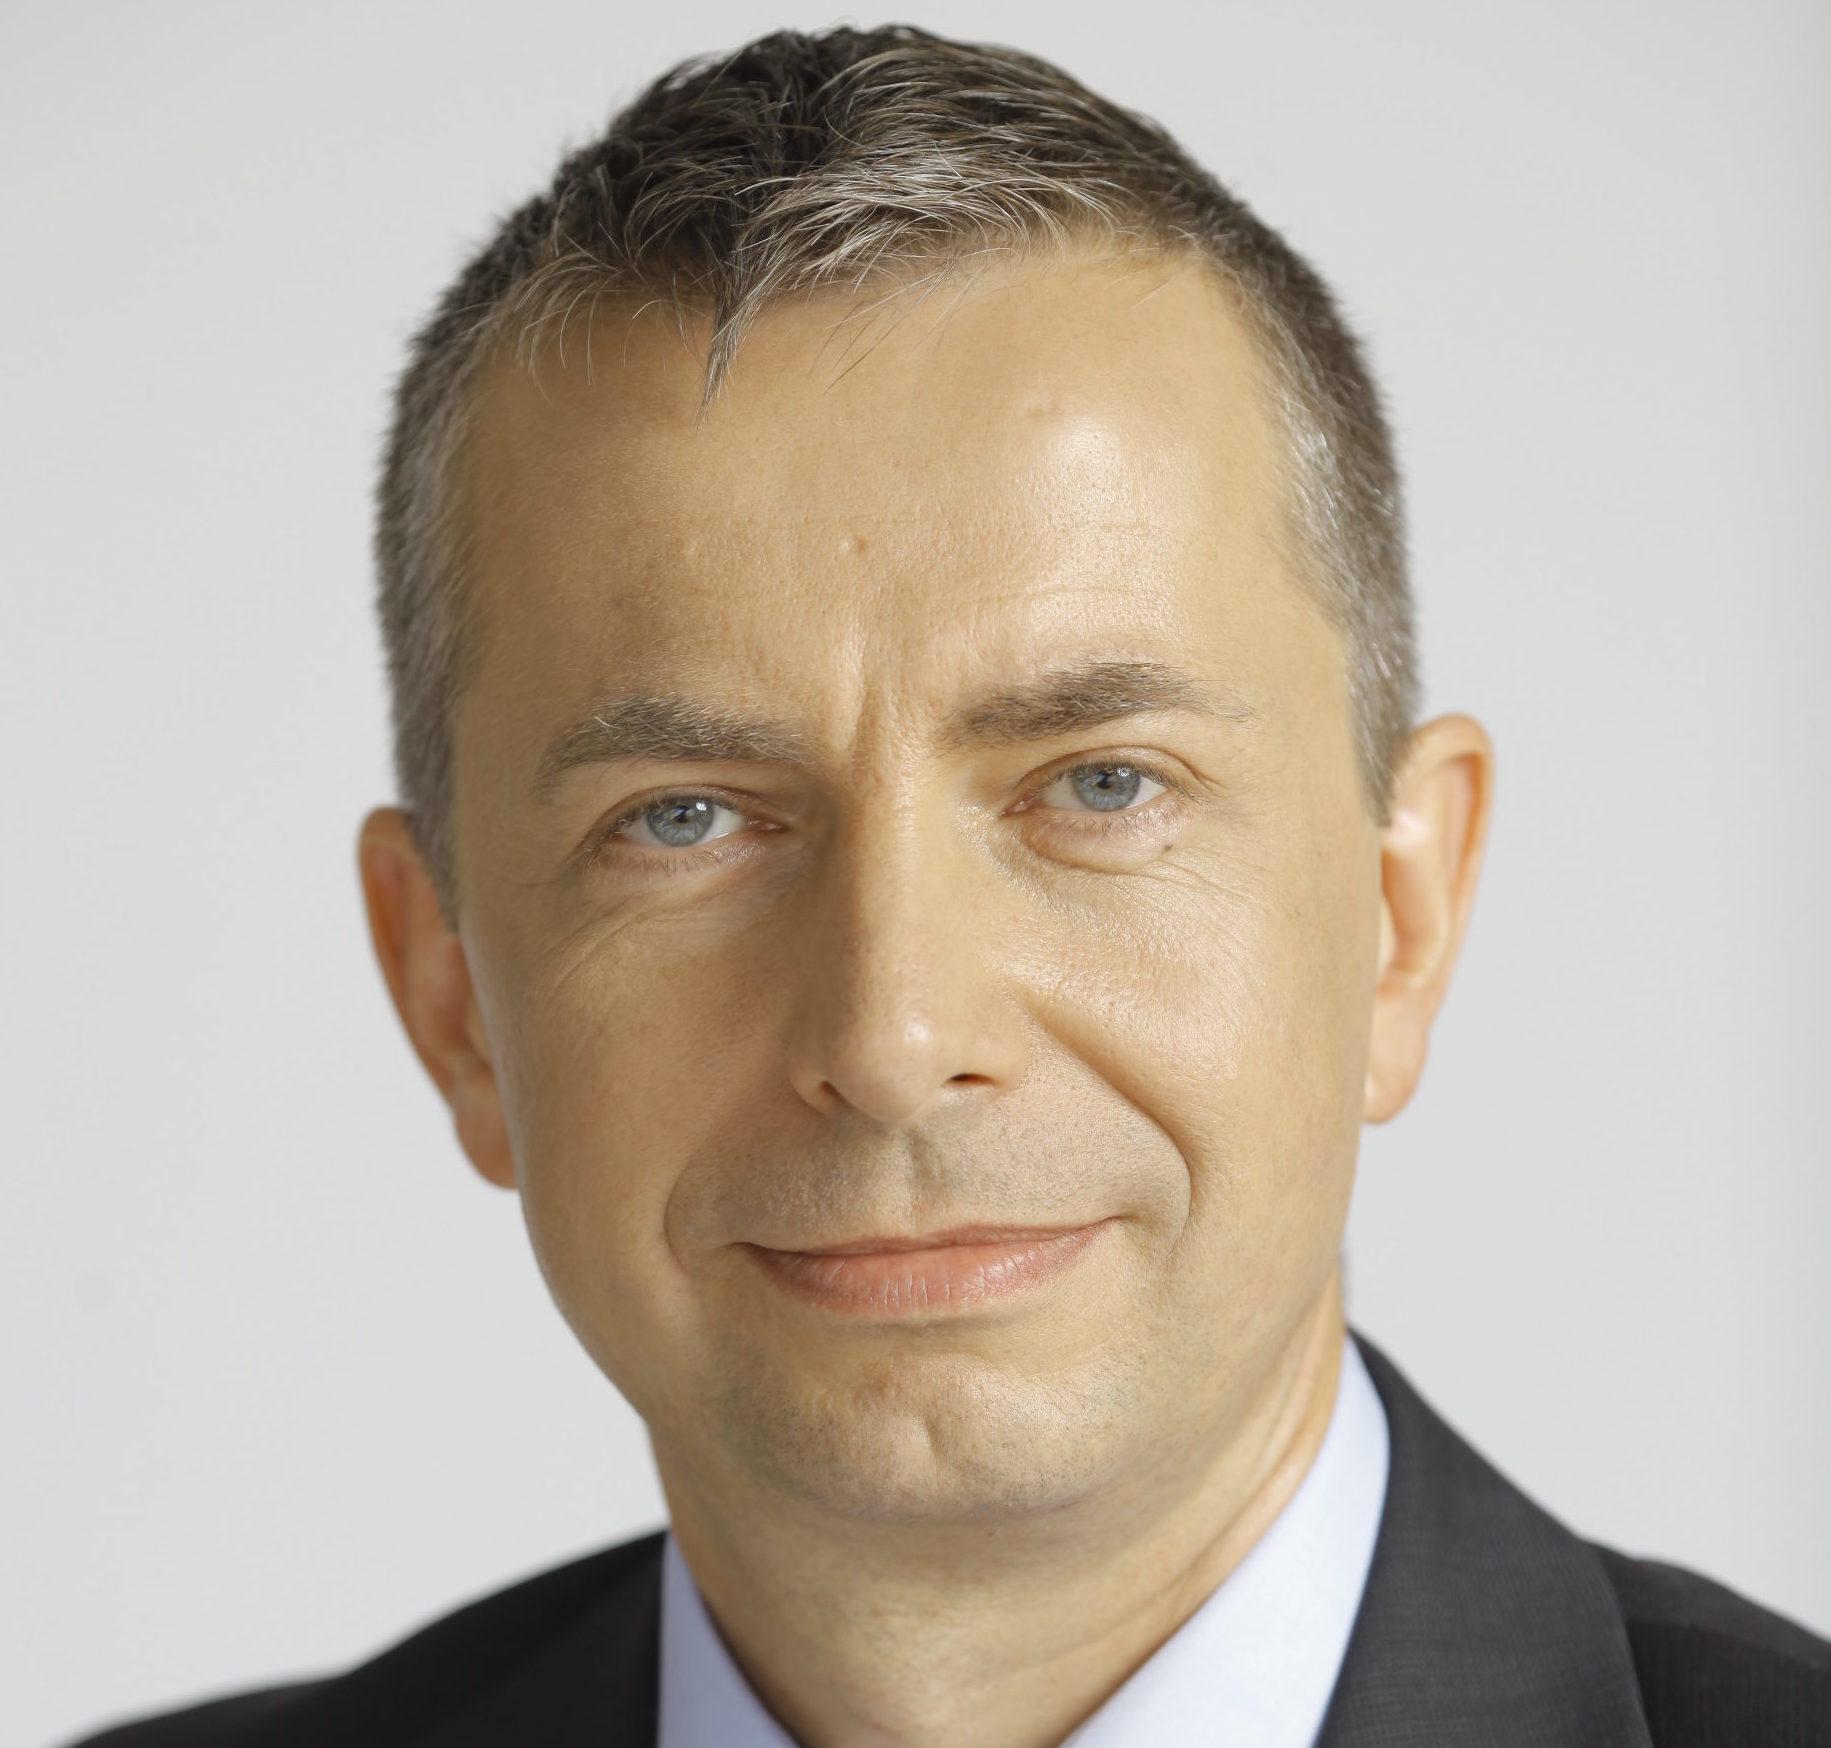 Dariusz Kucharski